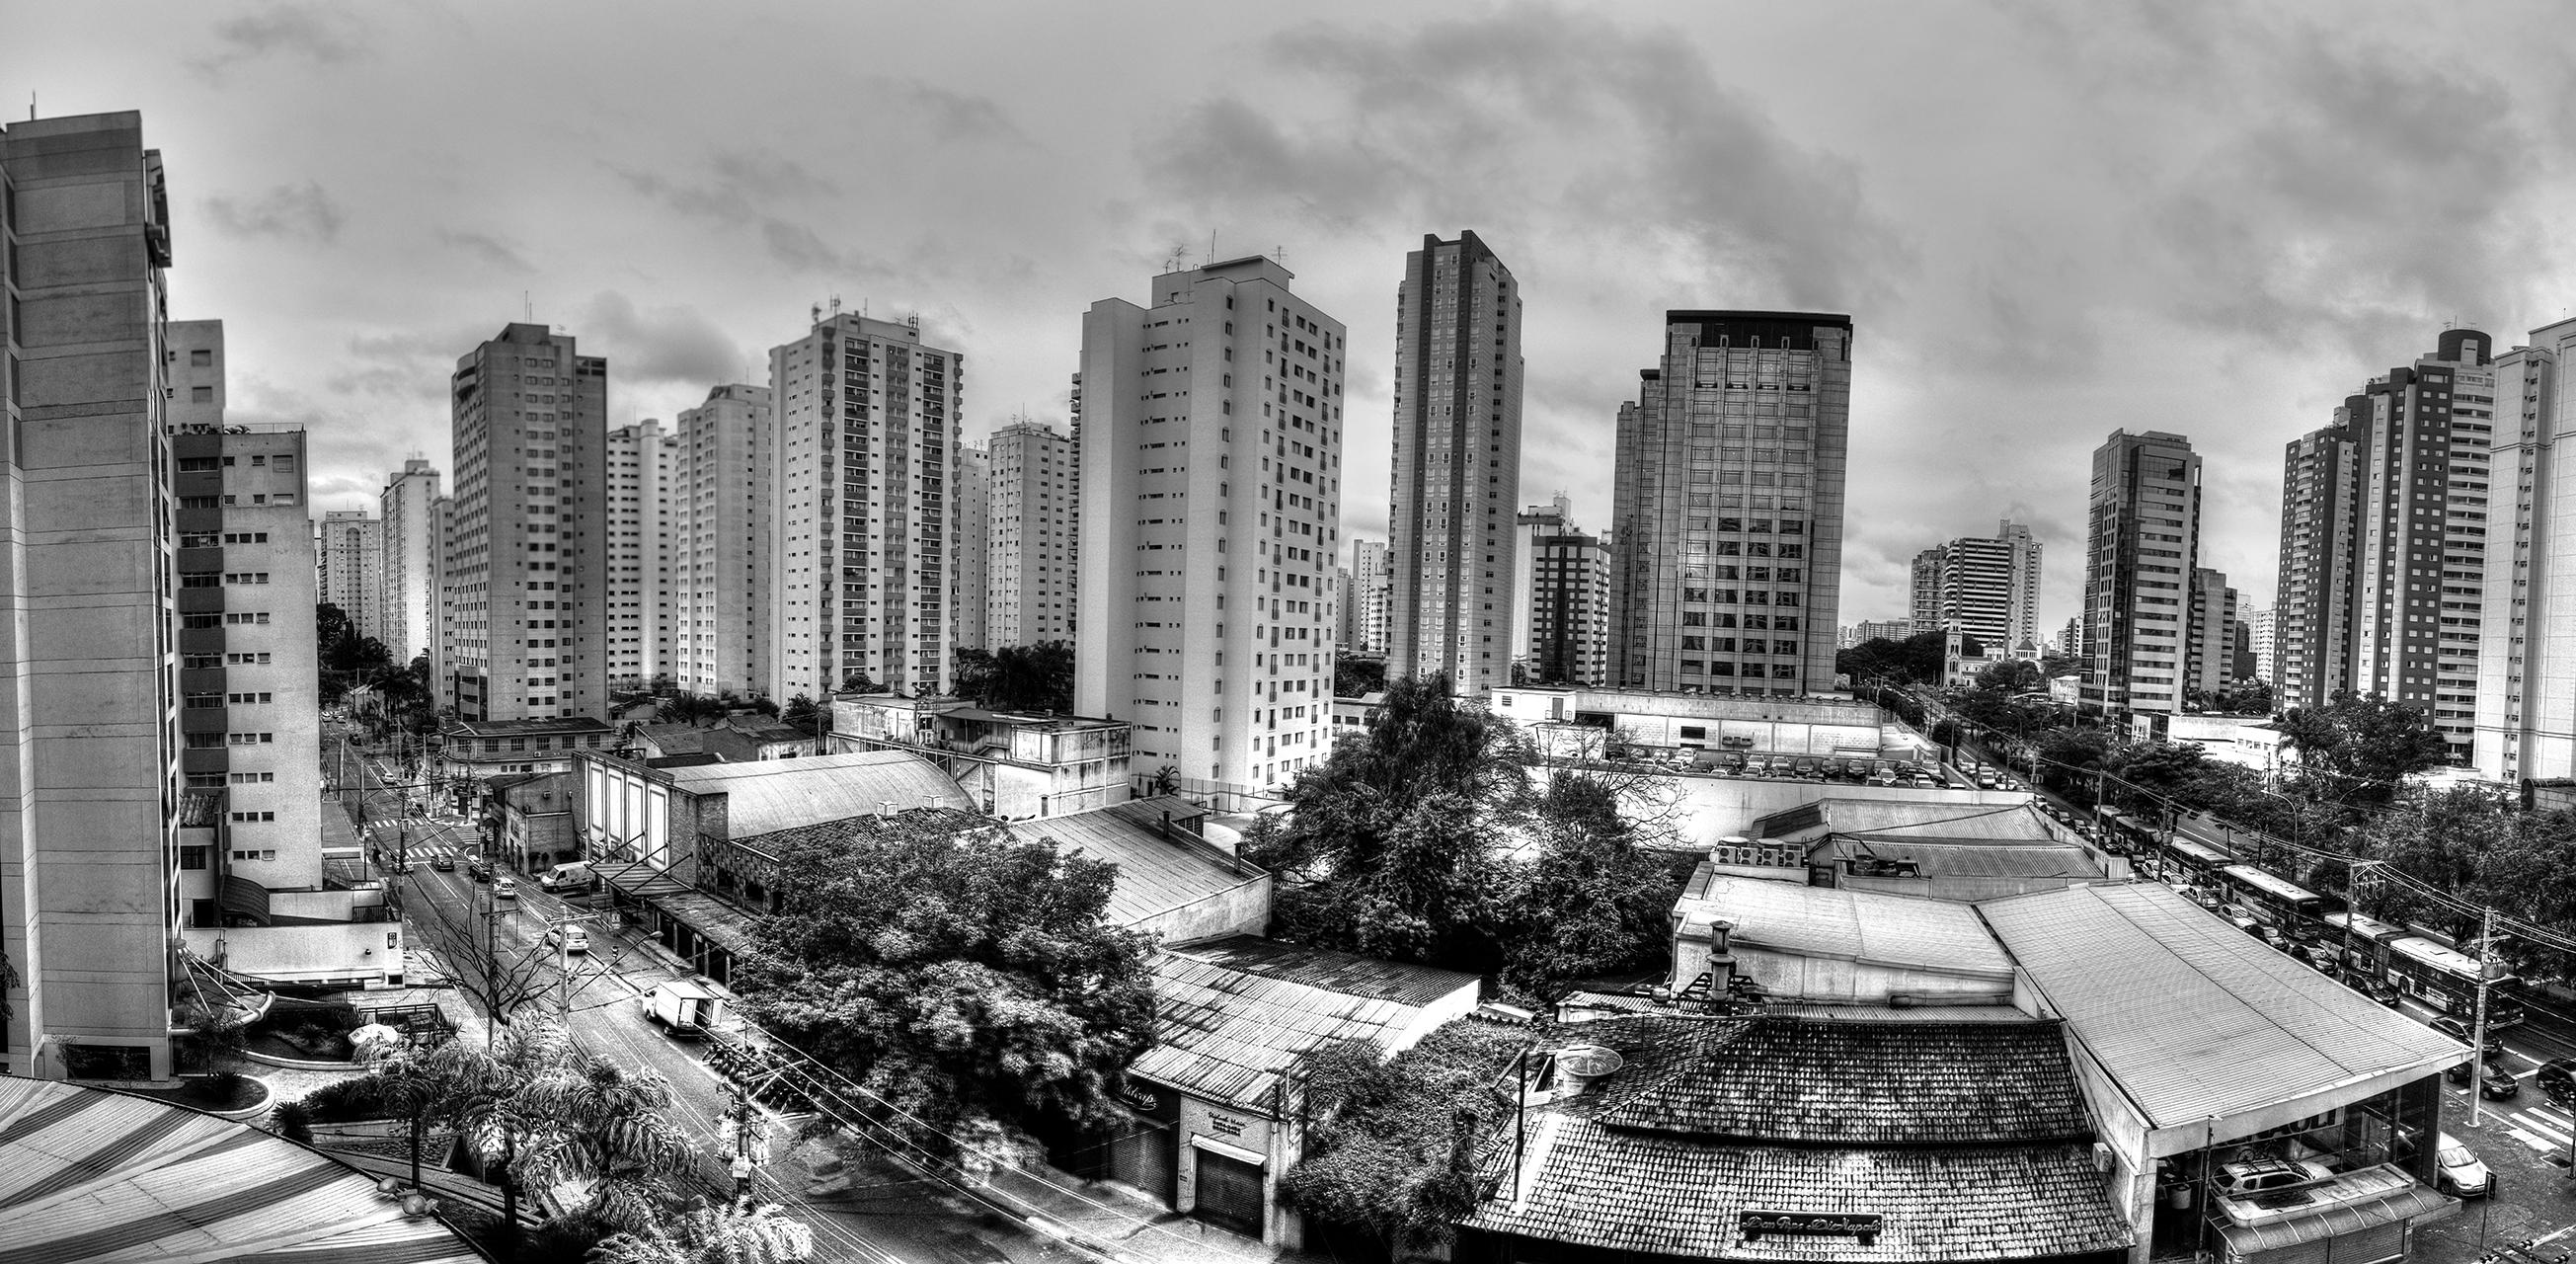 Sao Paulo from my hotel window